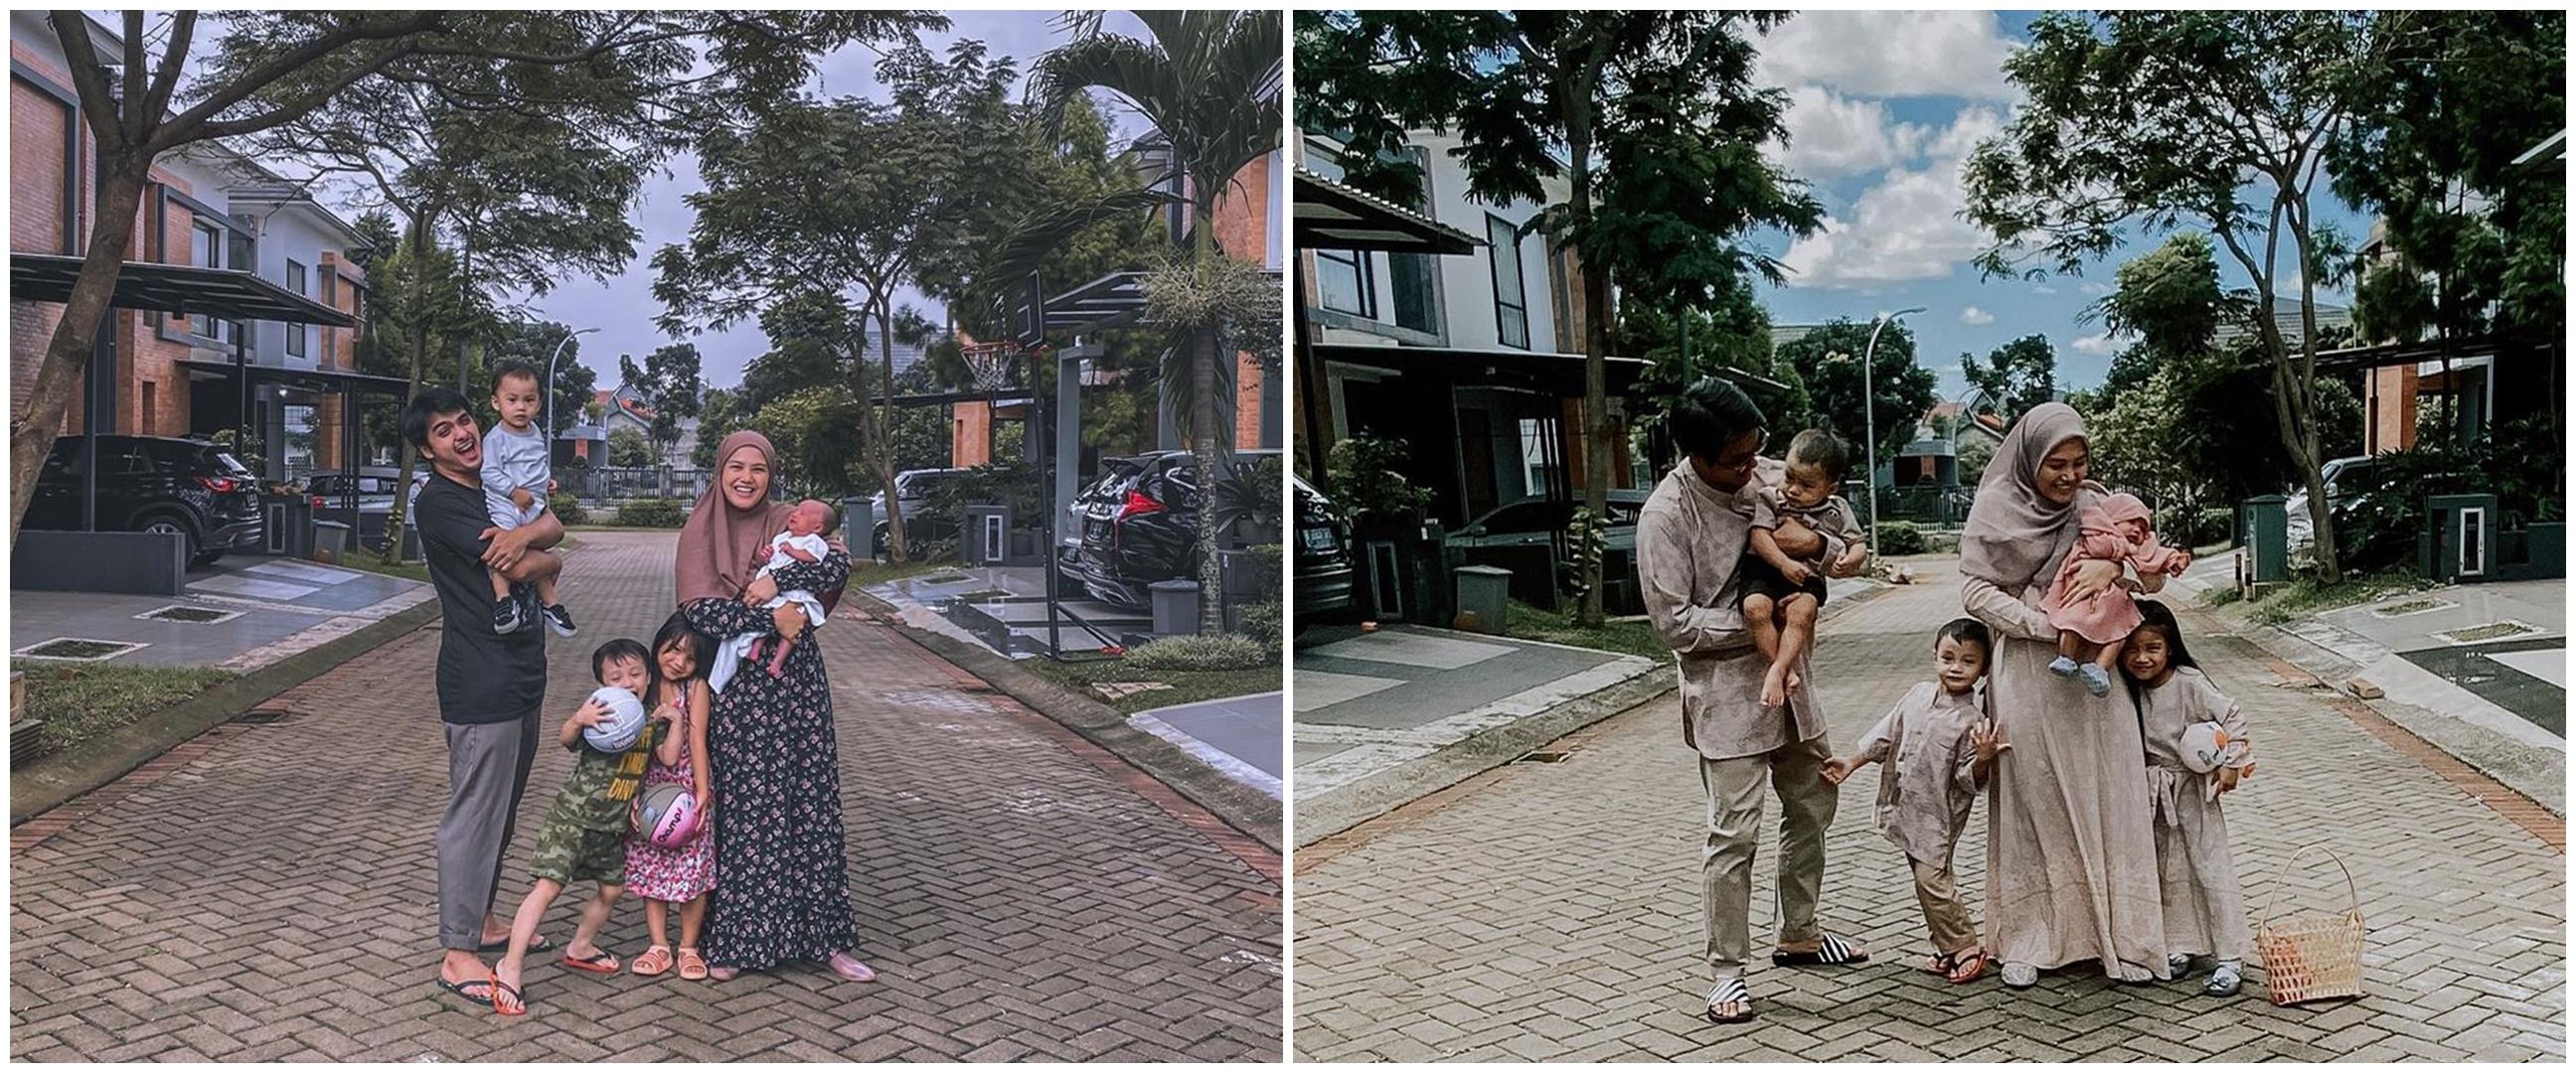 7 Tahun menikah, ini 10 potret manis Ricky Harun & keluarga kecilnya